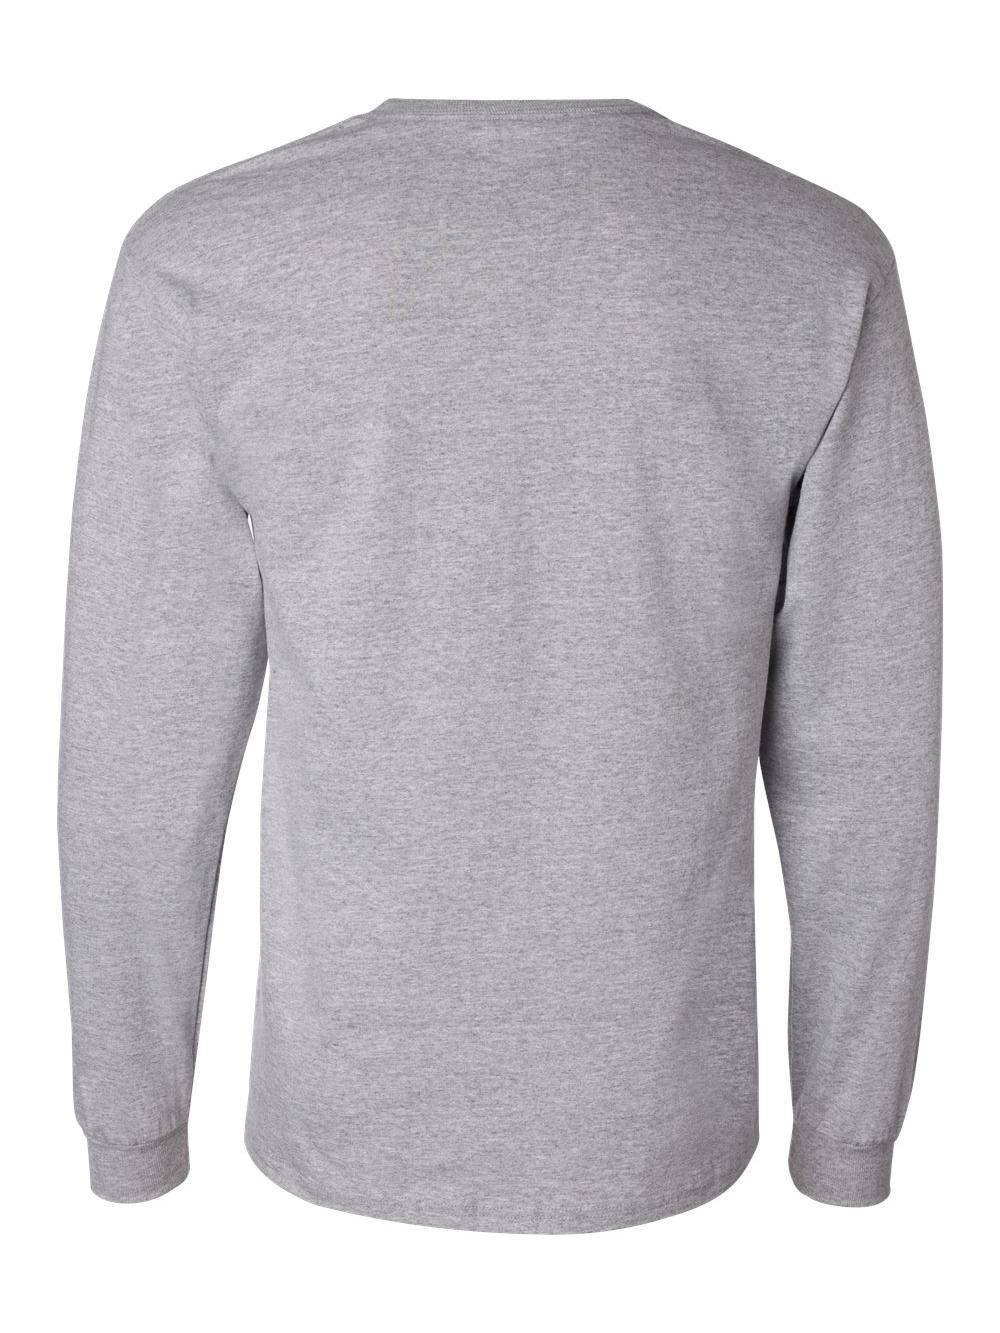 Champion-Long-Sleeve-T-Shirt-CC8C thumbnail 7